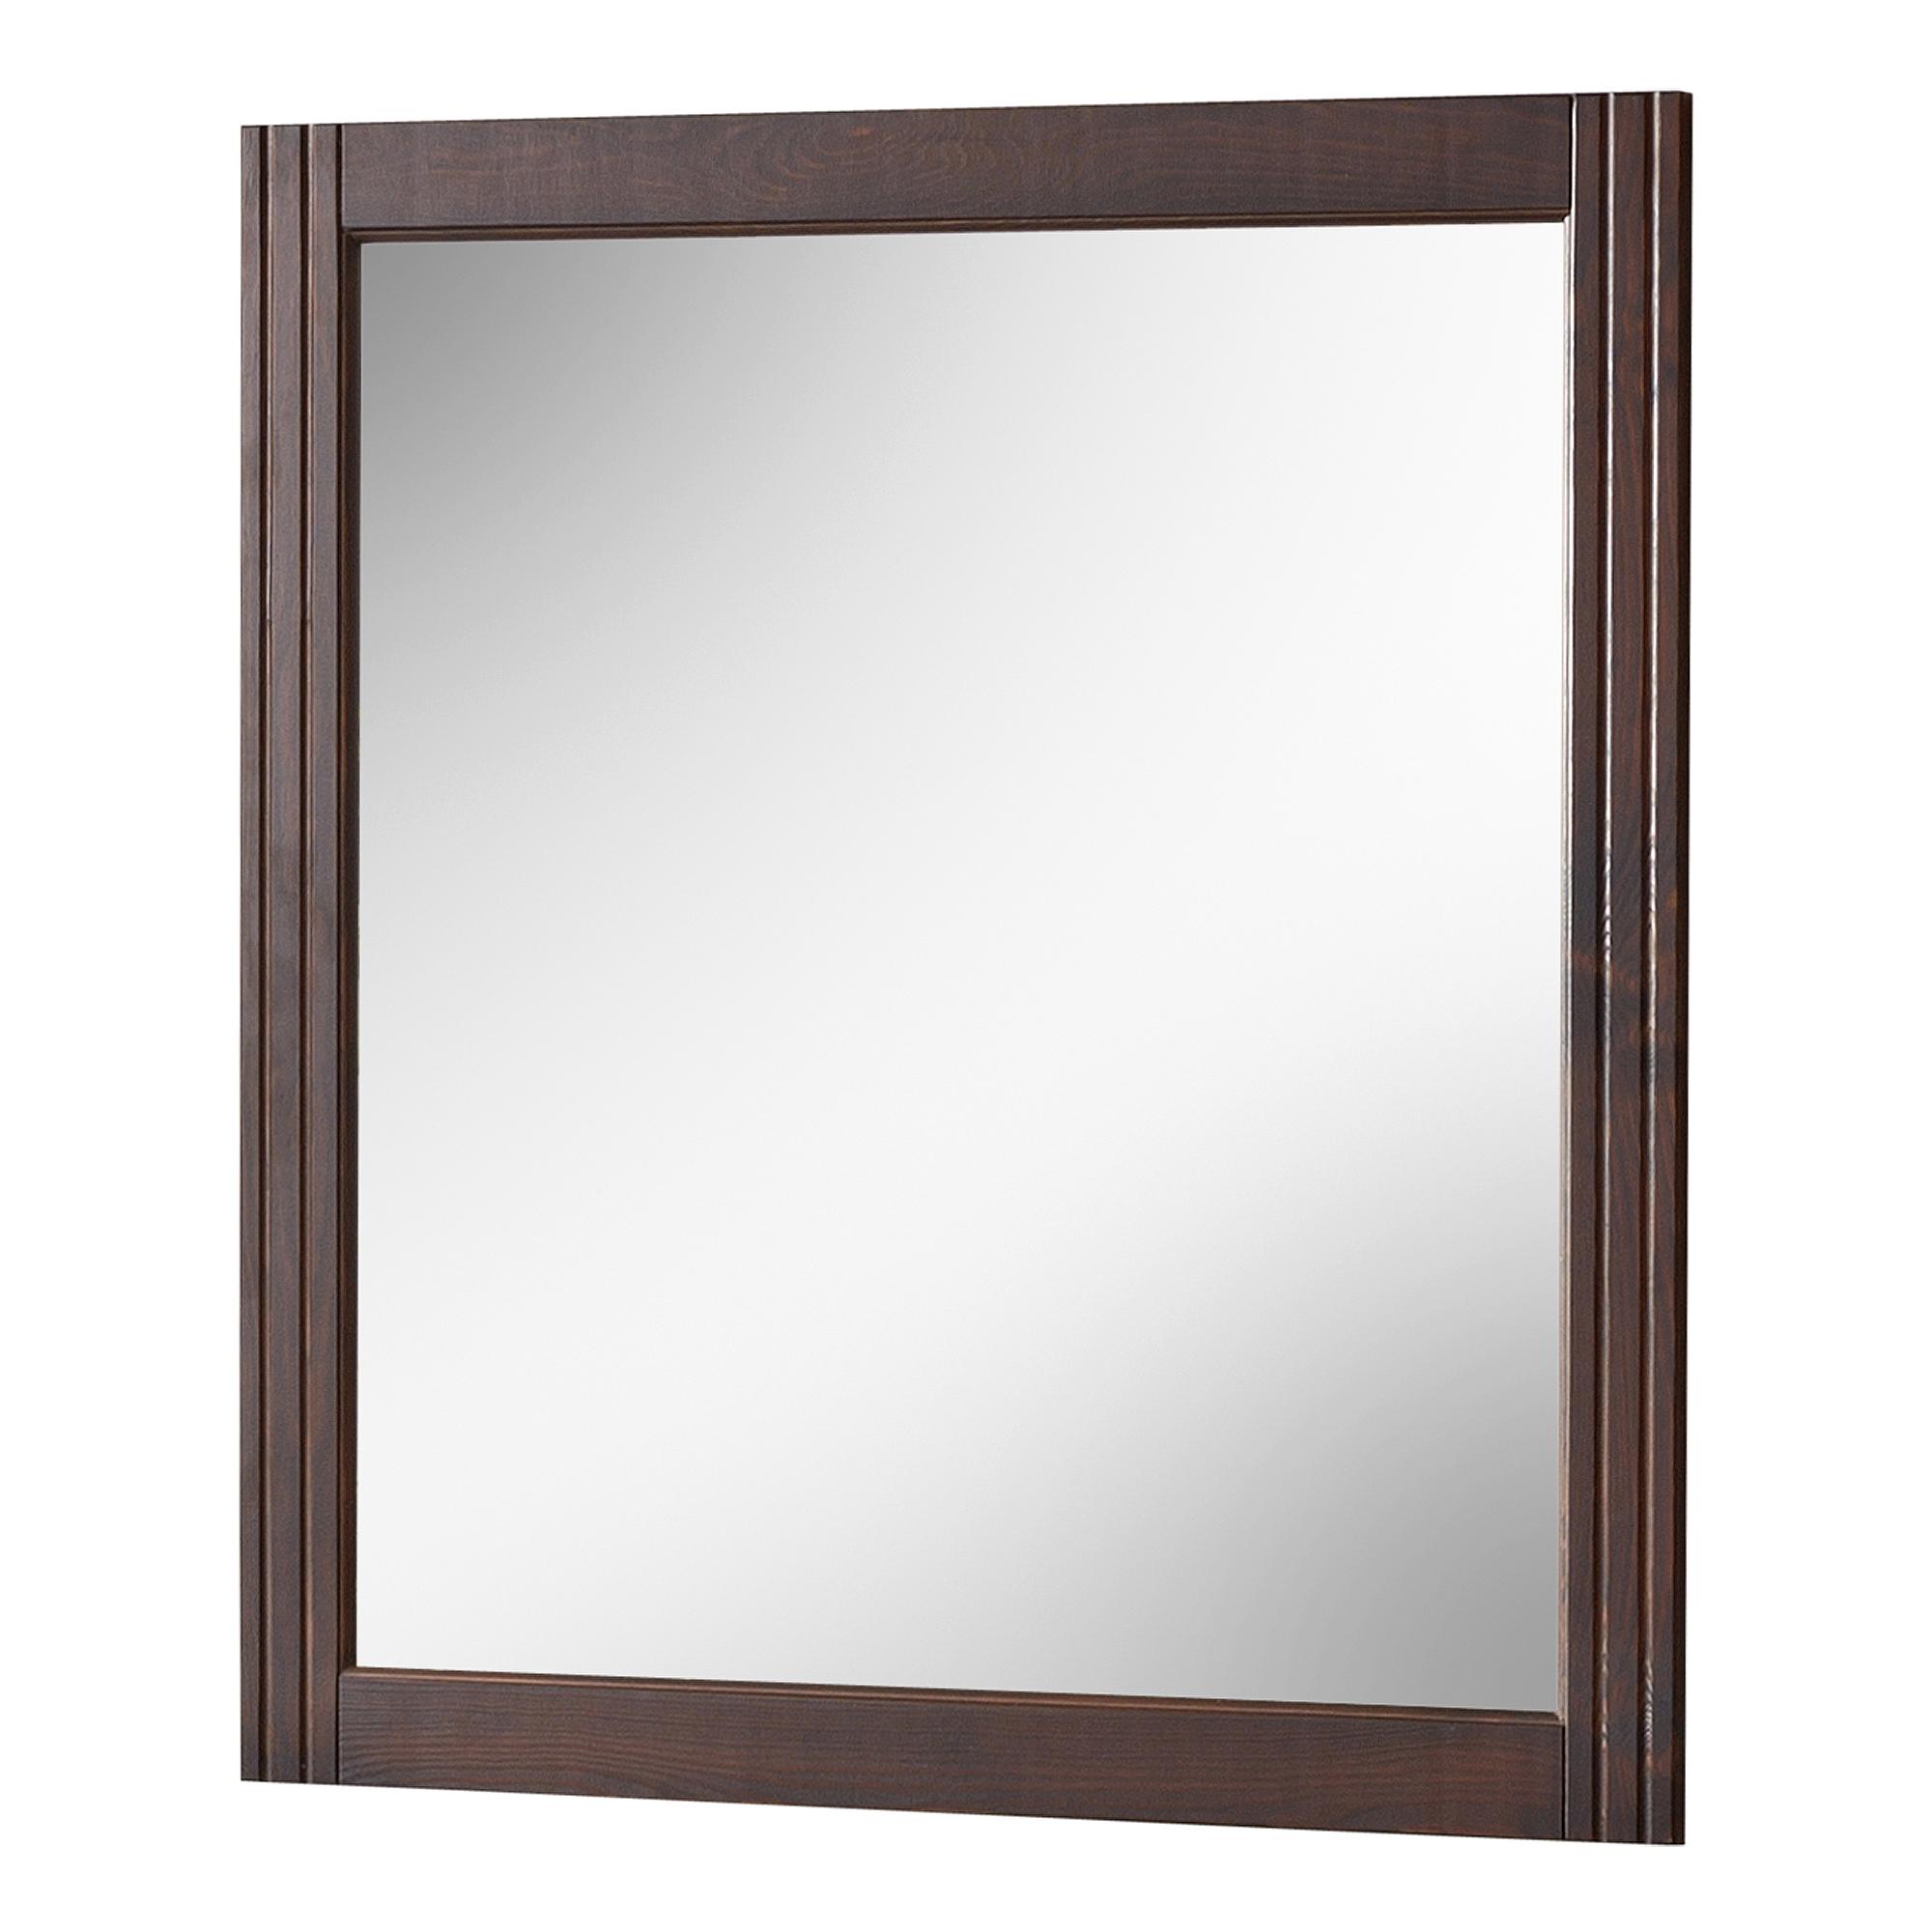 Oglinda pentru baie L80xl74 cm Retro